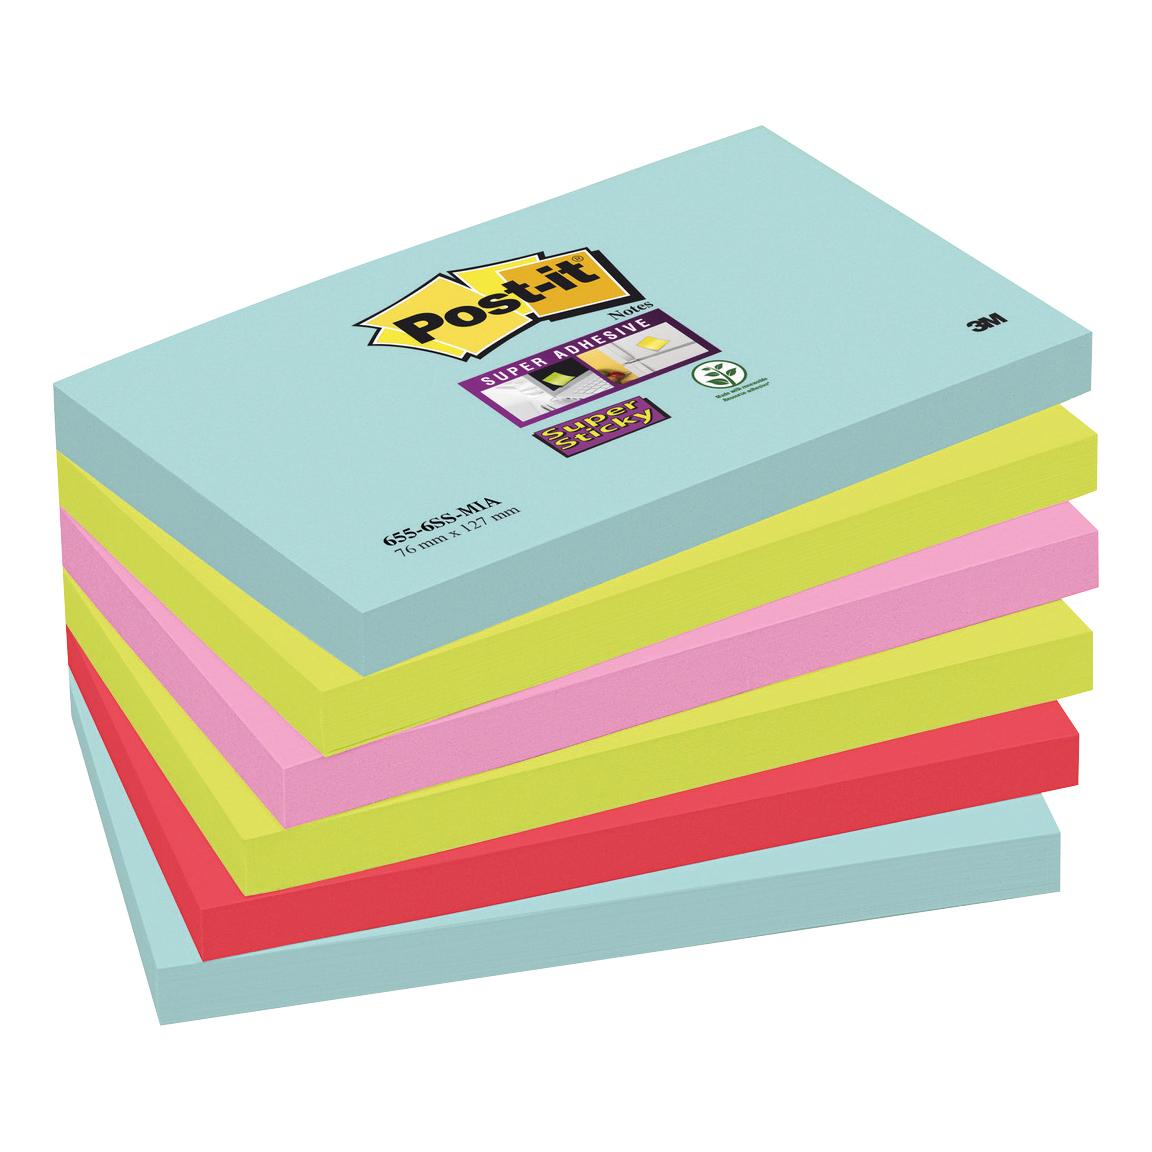 Post-It Super Sticky Notes Miami 76x127mm Bright Colours Ref 655-6SS-MIA Pack 6 2 For 1 Apr-Jun 2019